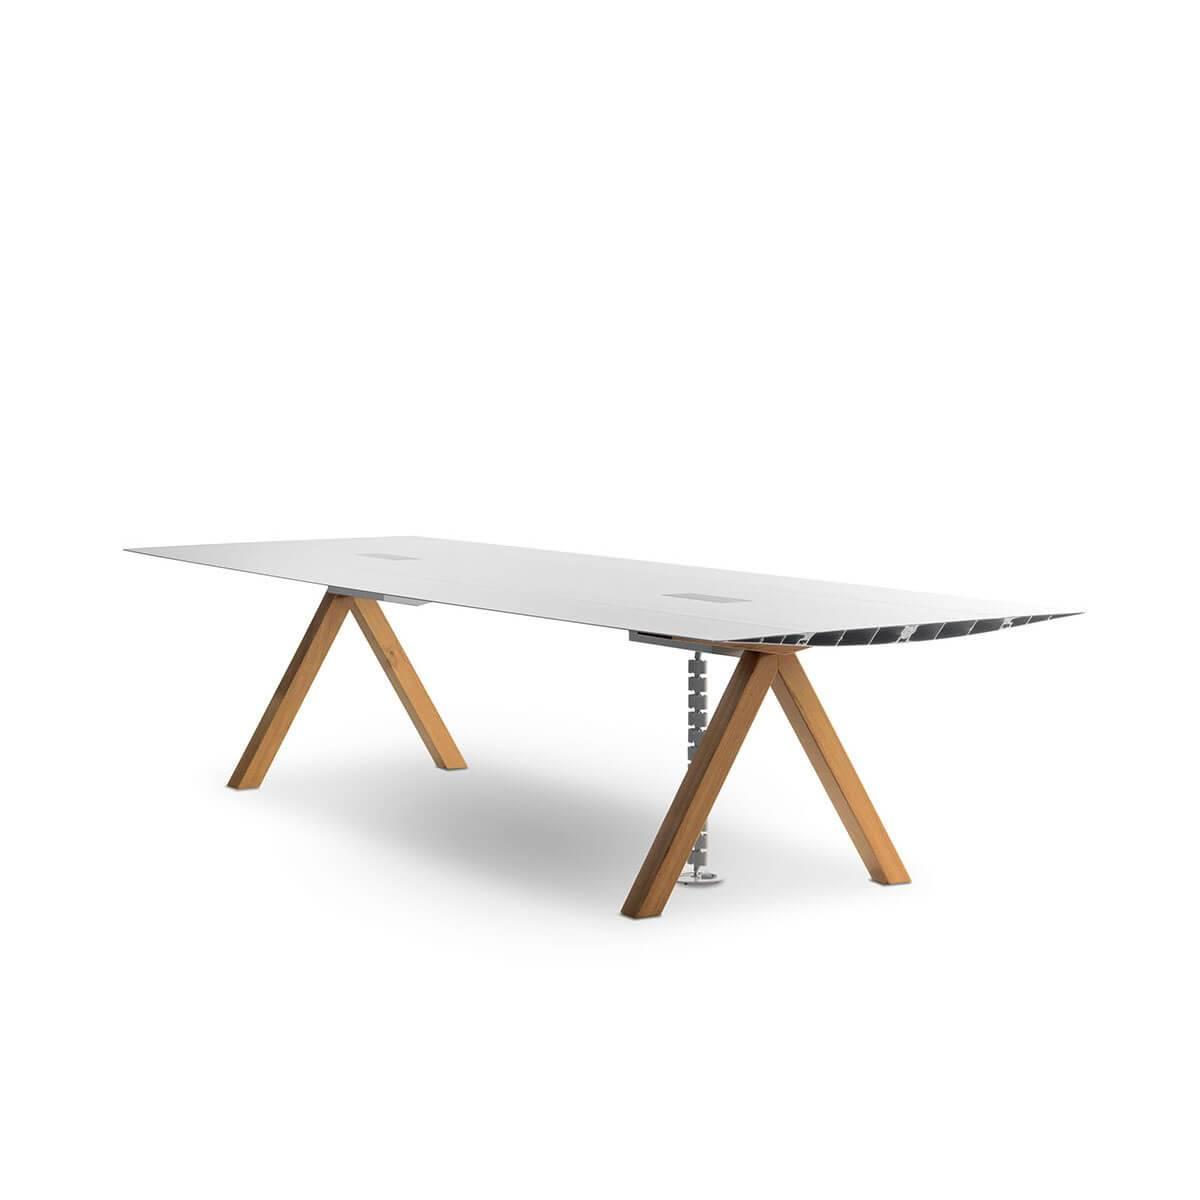 b.d barcelona design  Table B Cable Management 办公桌